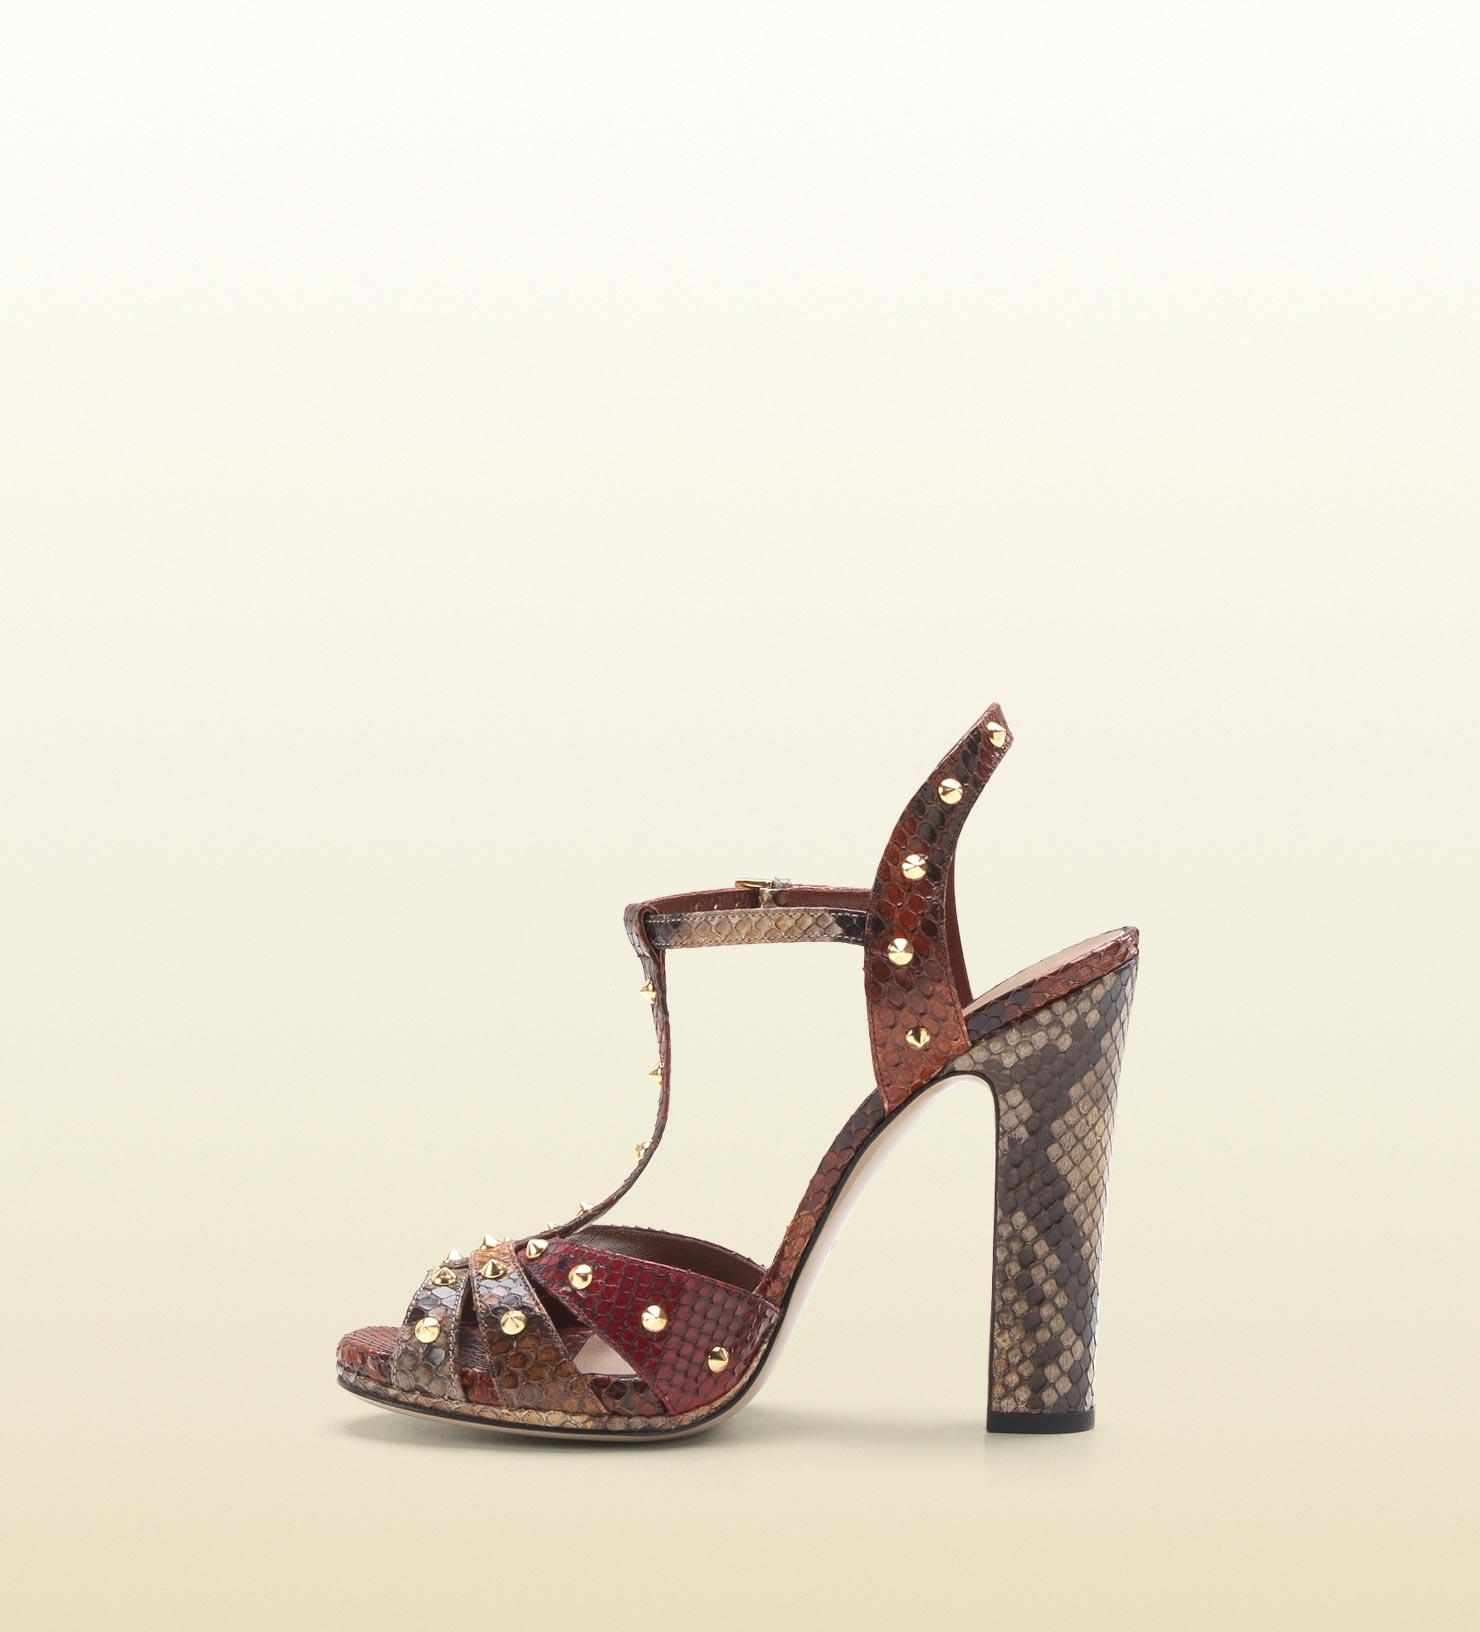 1ee6548cd8 Lyst - Gucci Jacquelyne Studded Strappy High Heel Platform Sandal in ...